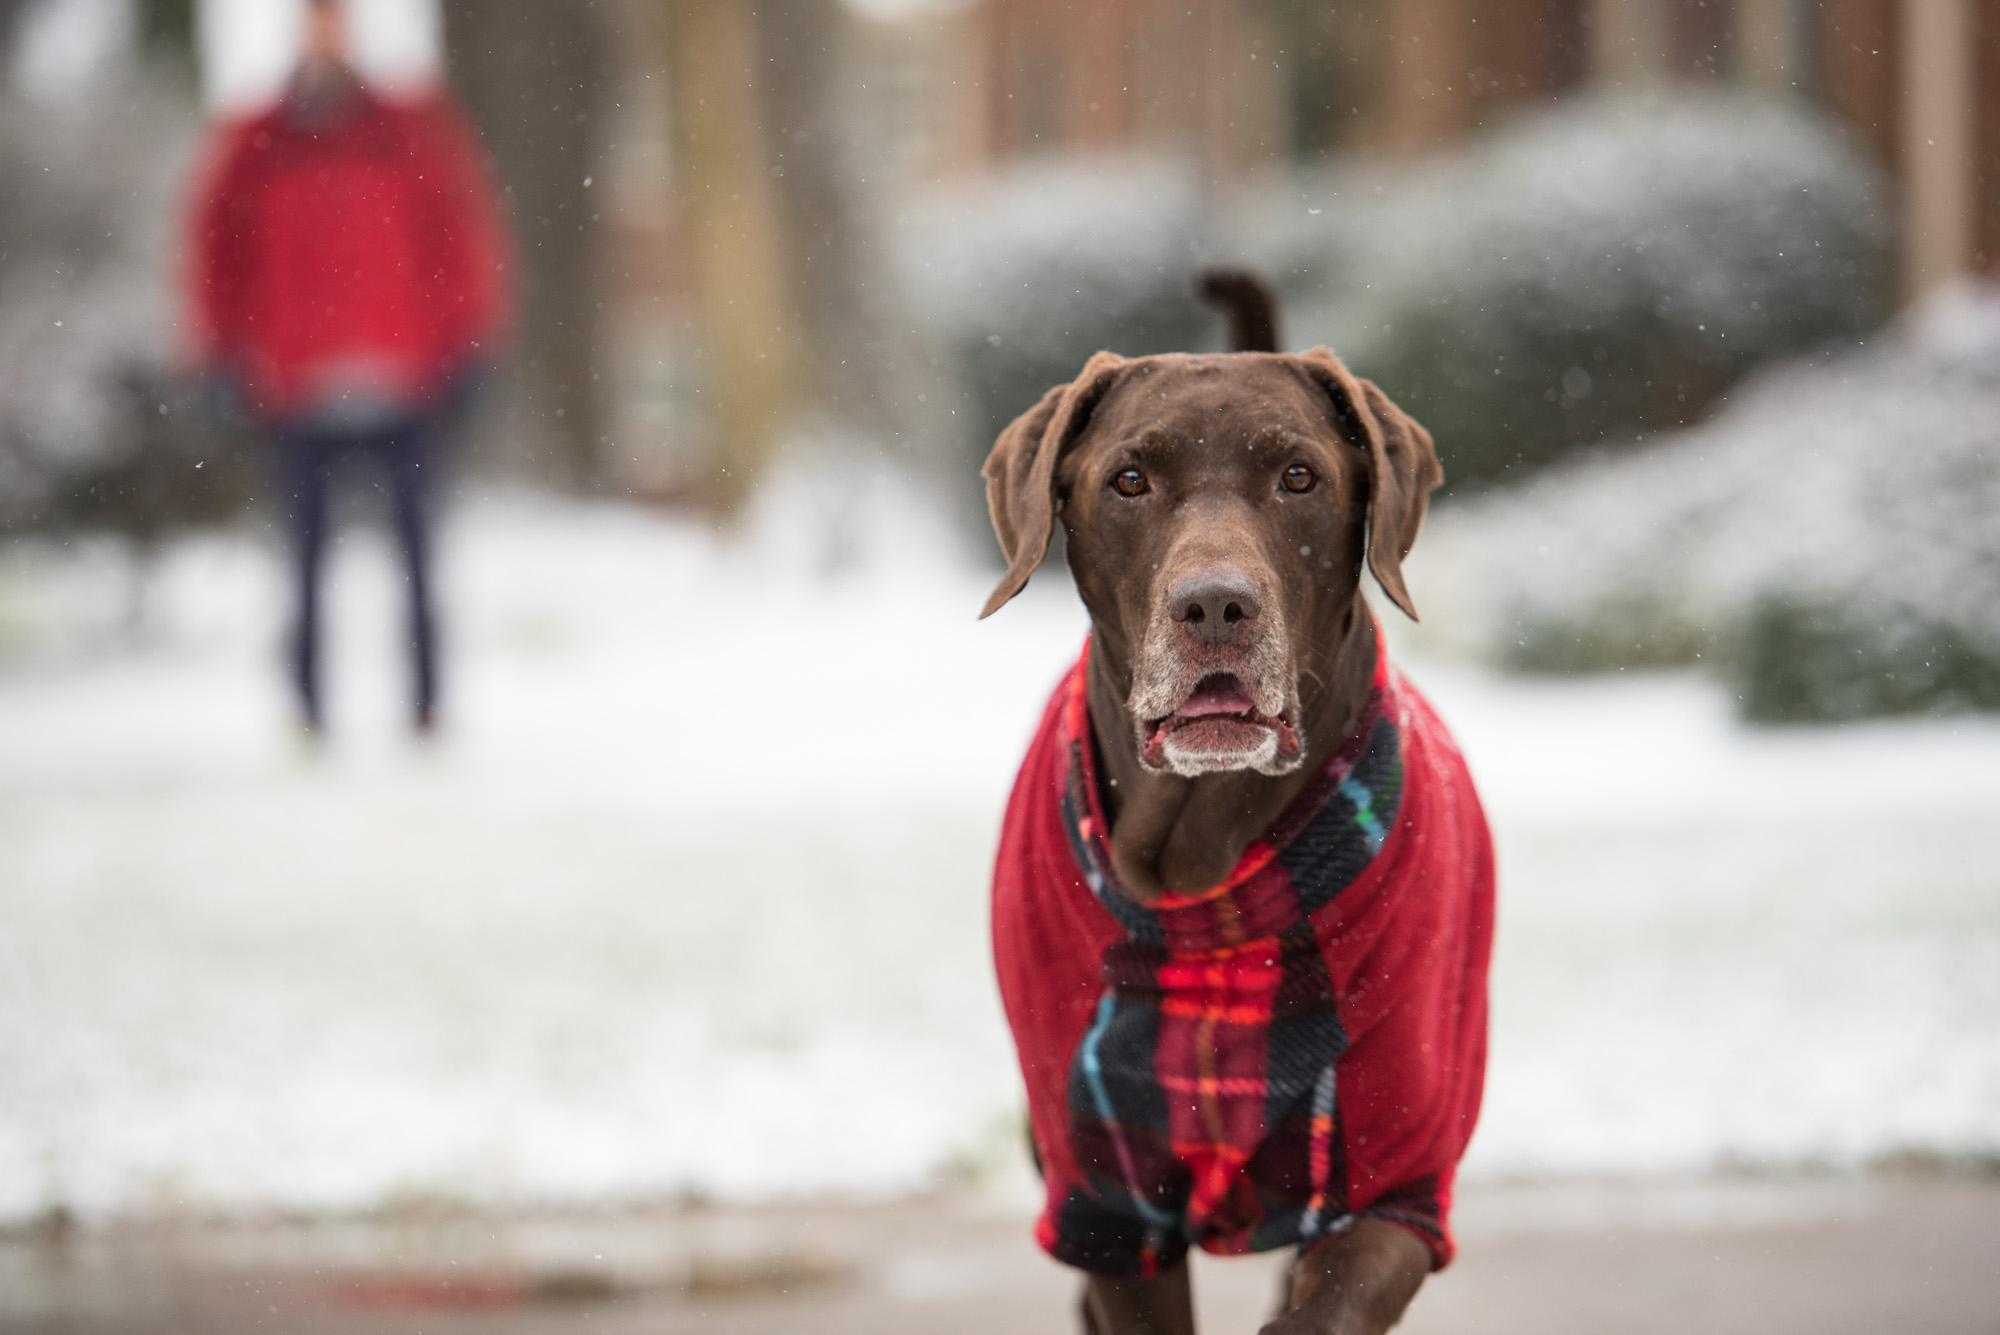 Dog in a coat.JPG